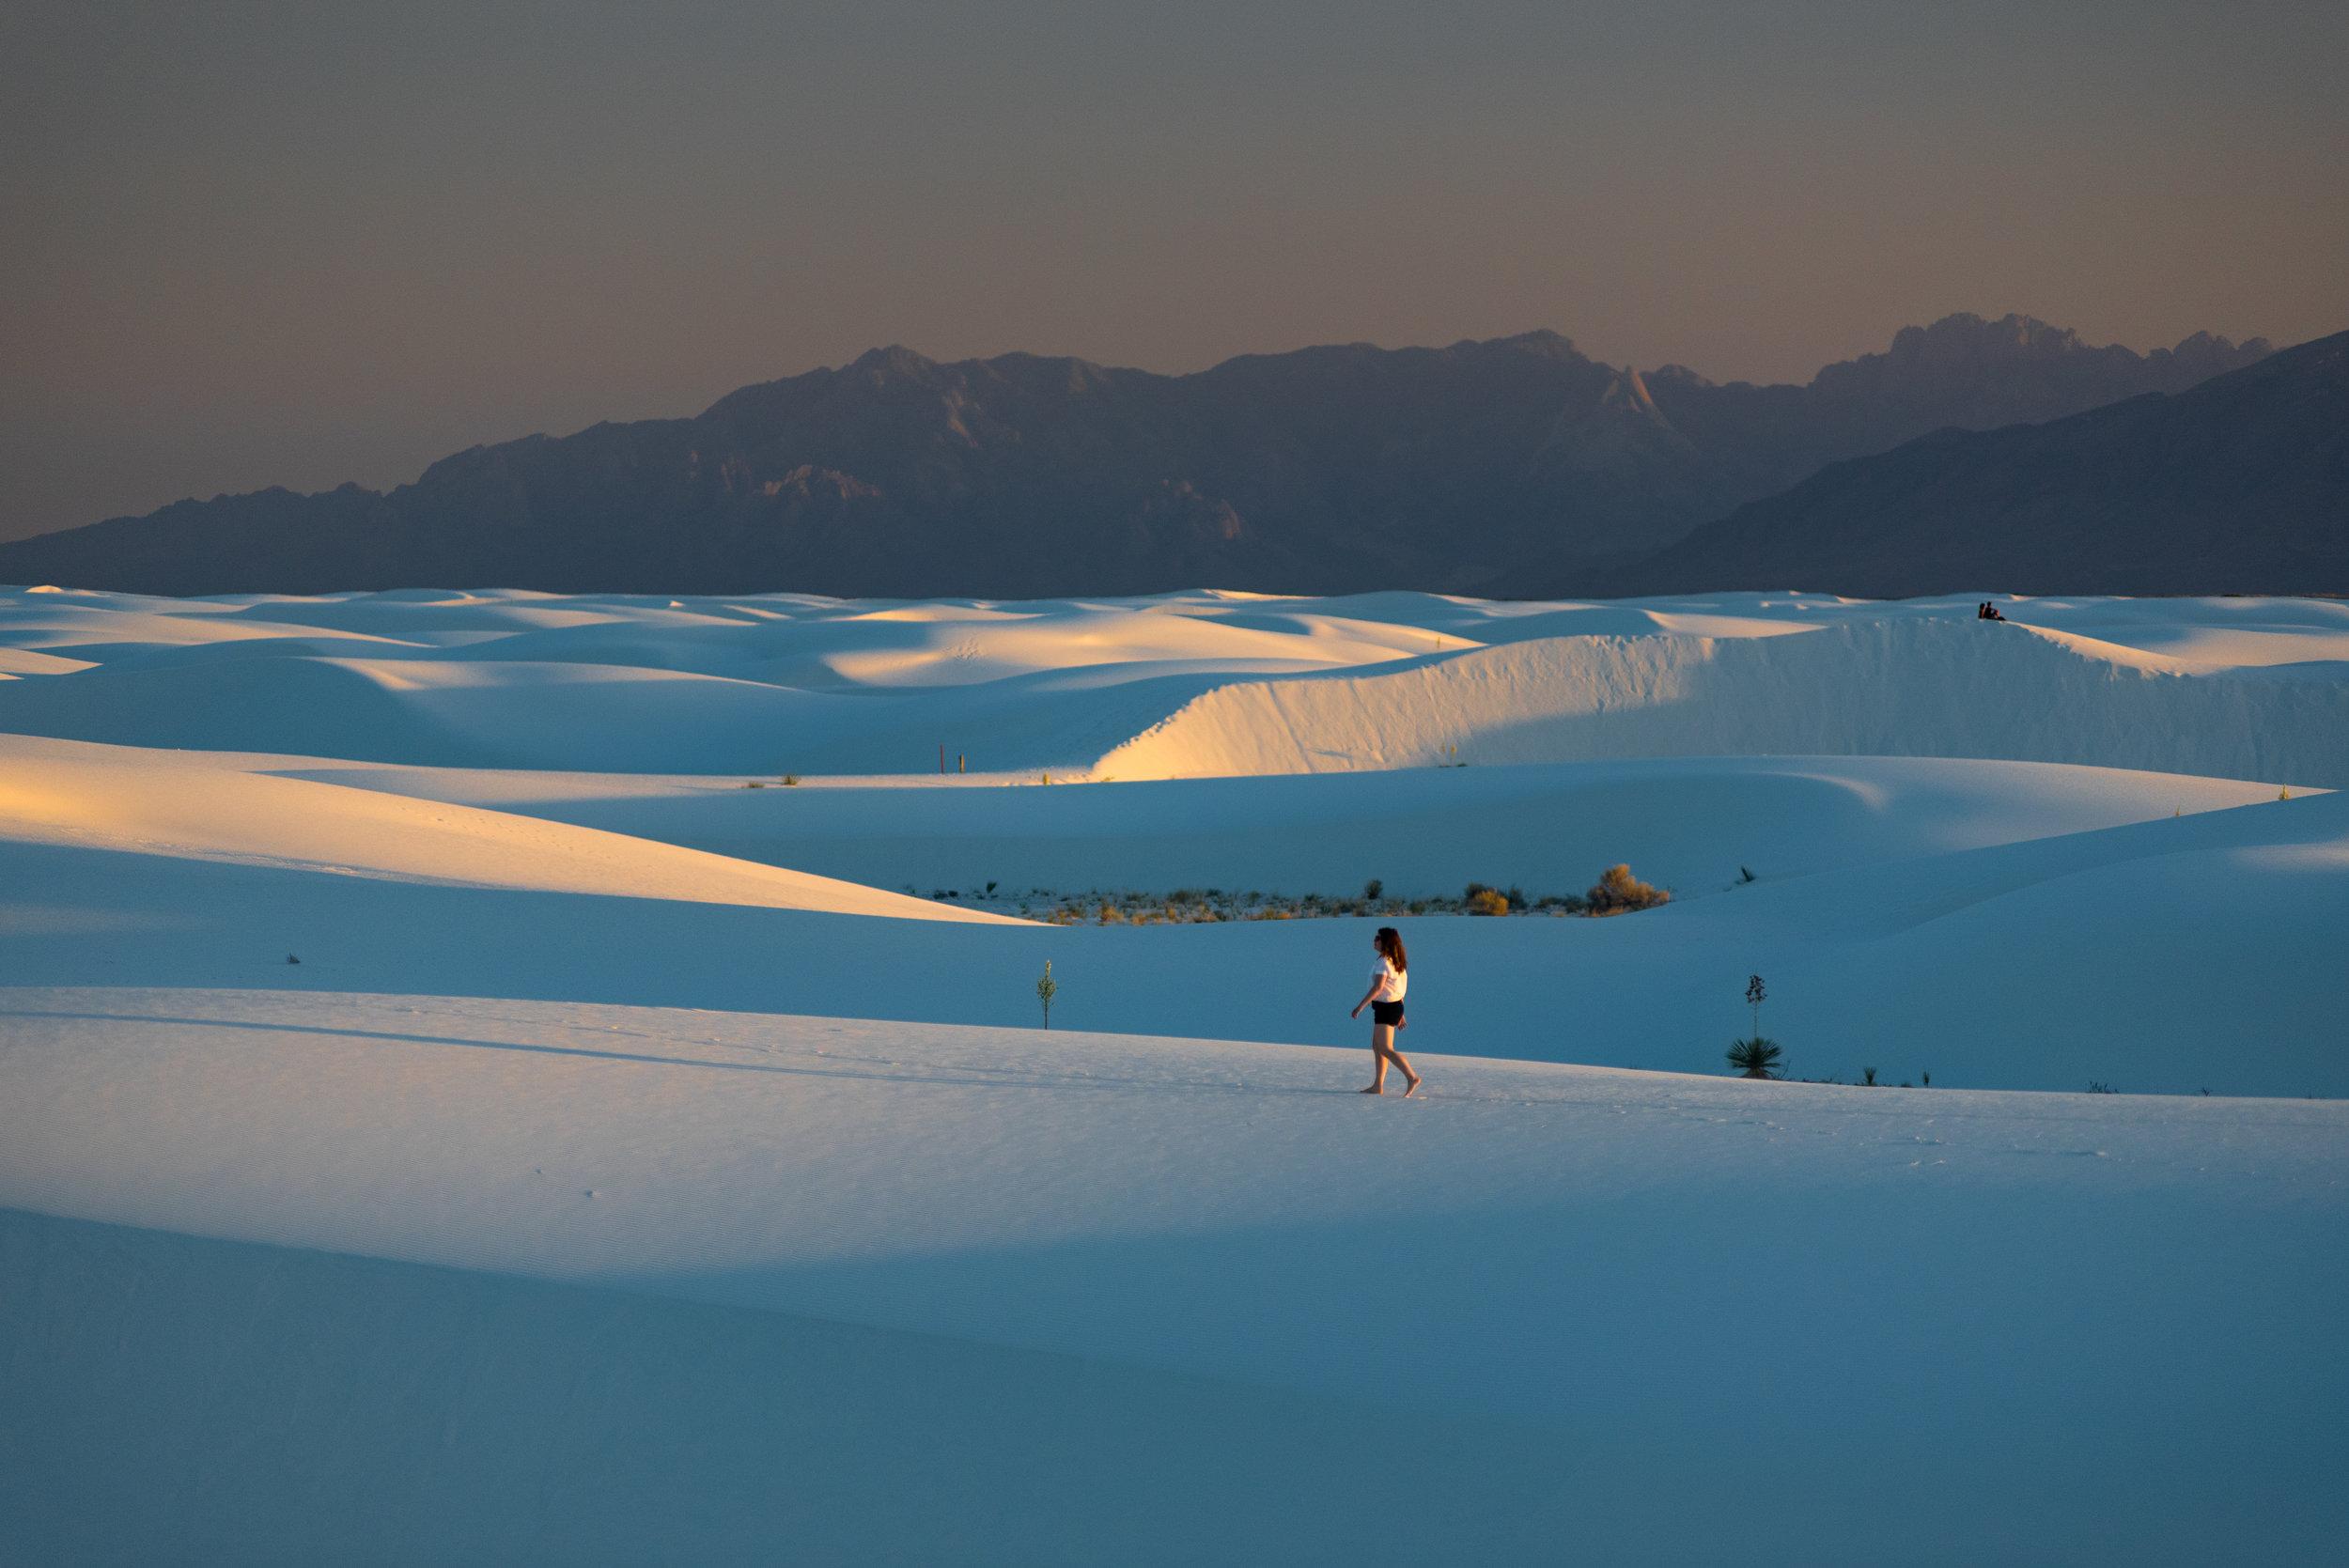 @danielleong17 - White Sands, NM